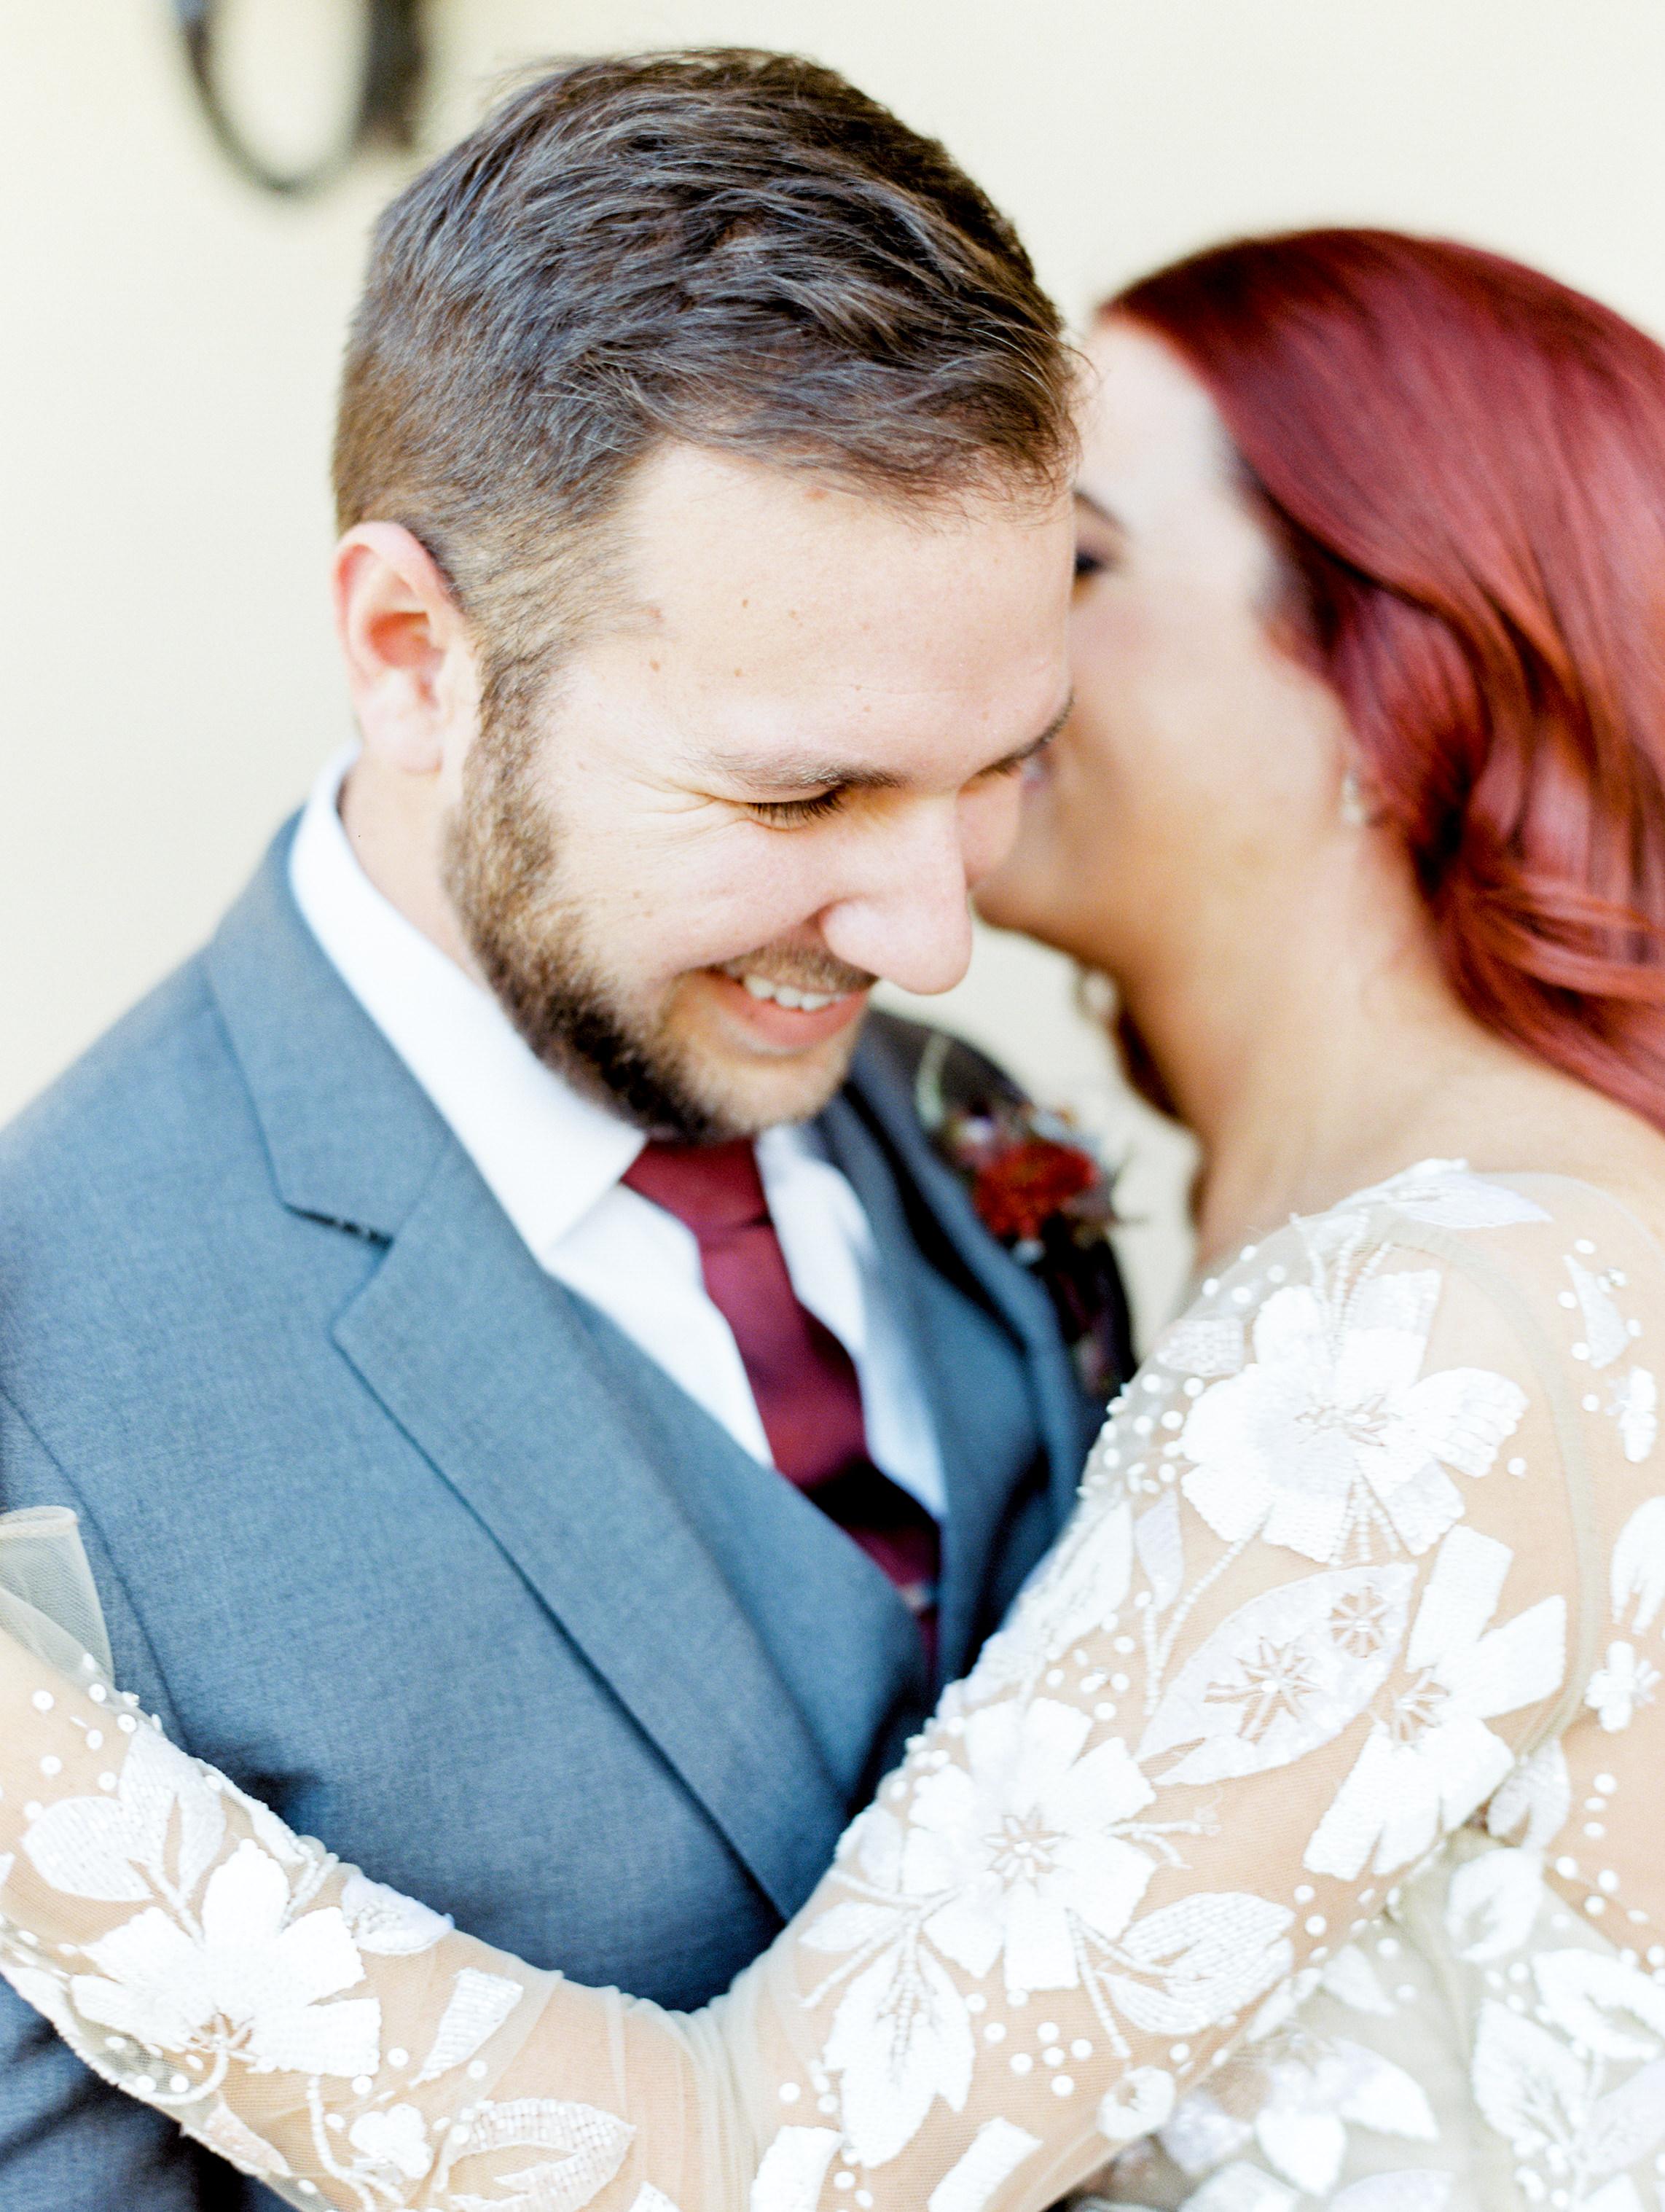 scribner-bend-vineyards-wedding-in-sacramento-california-37.jpg